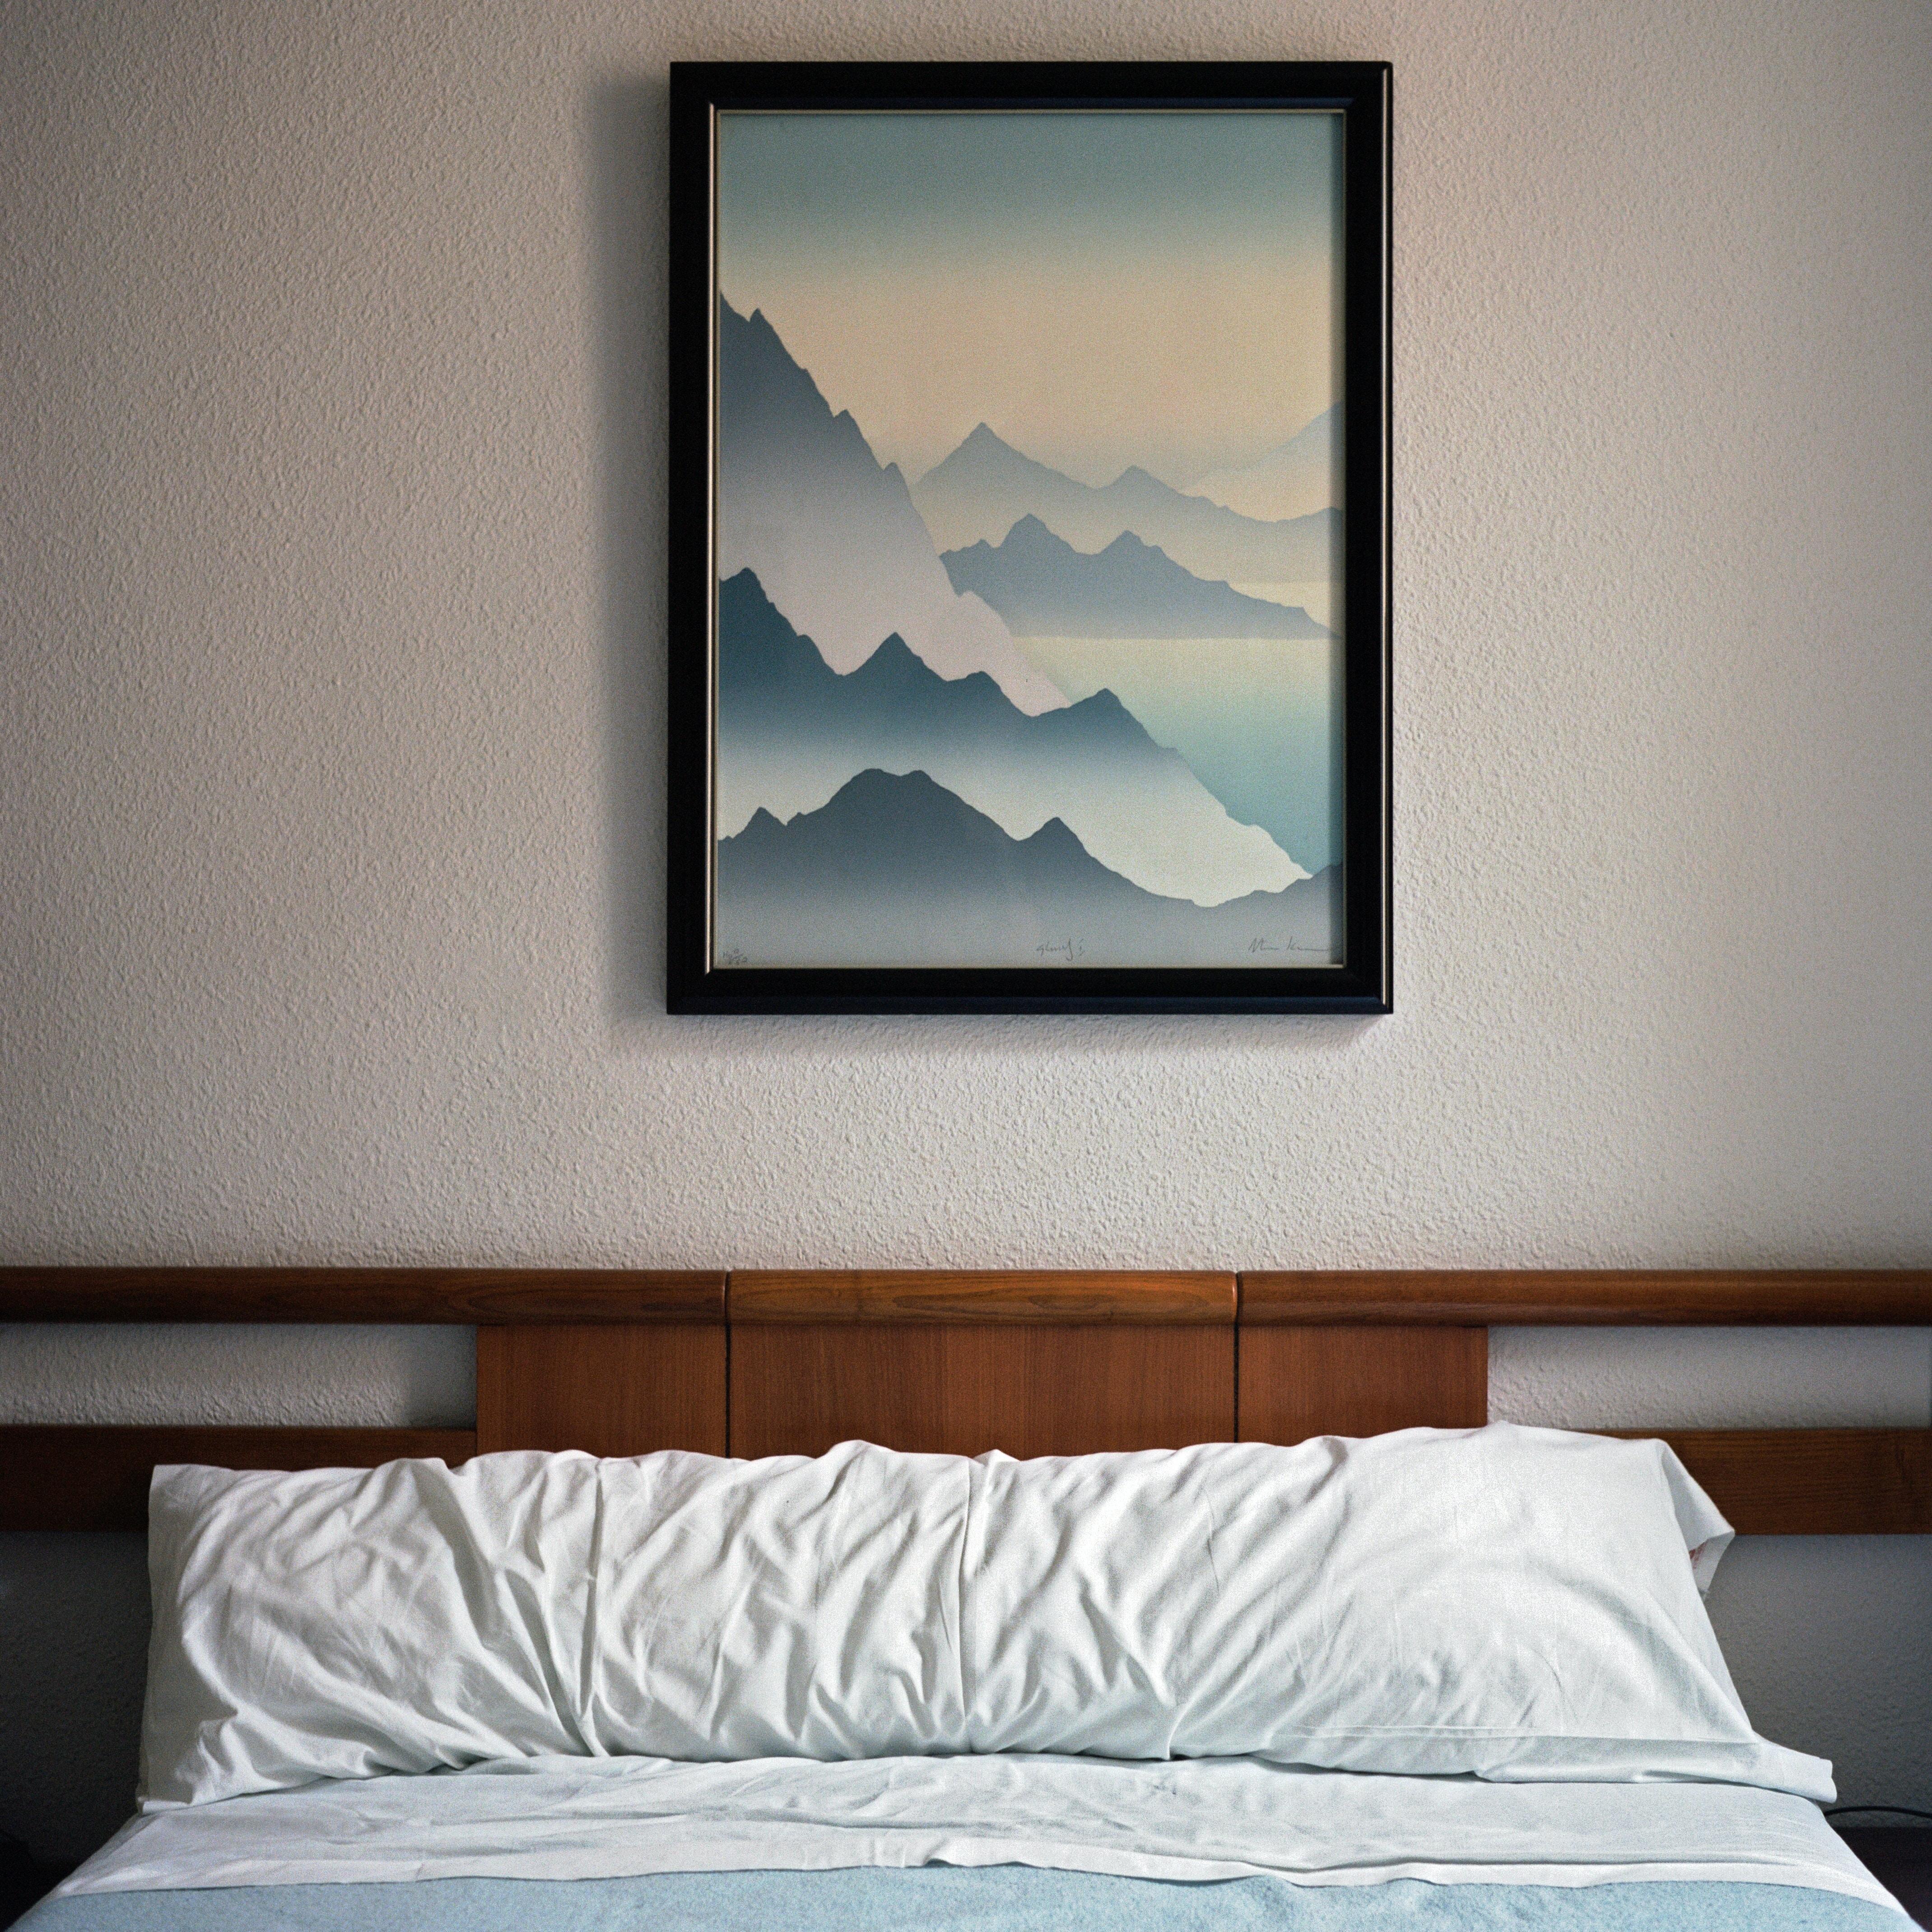 black wooden framed decor